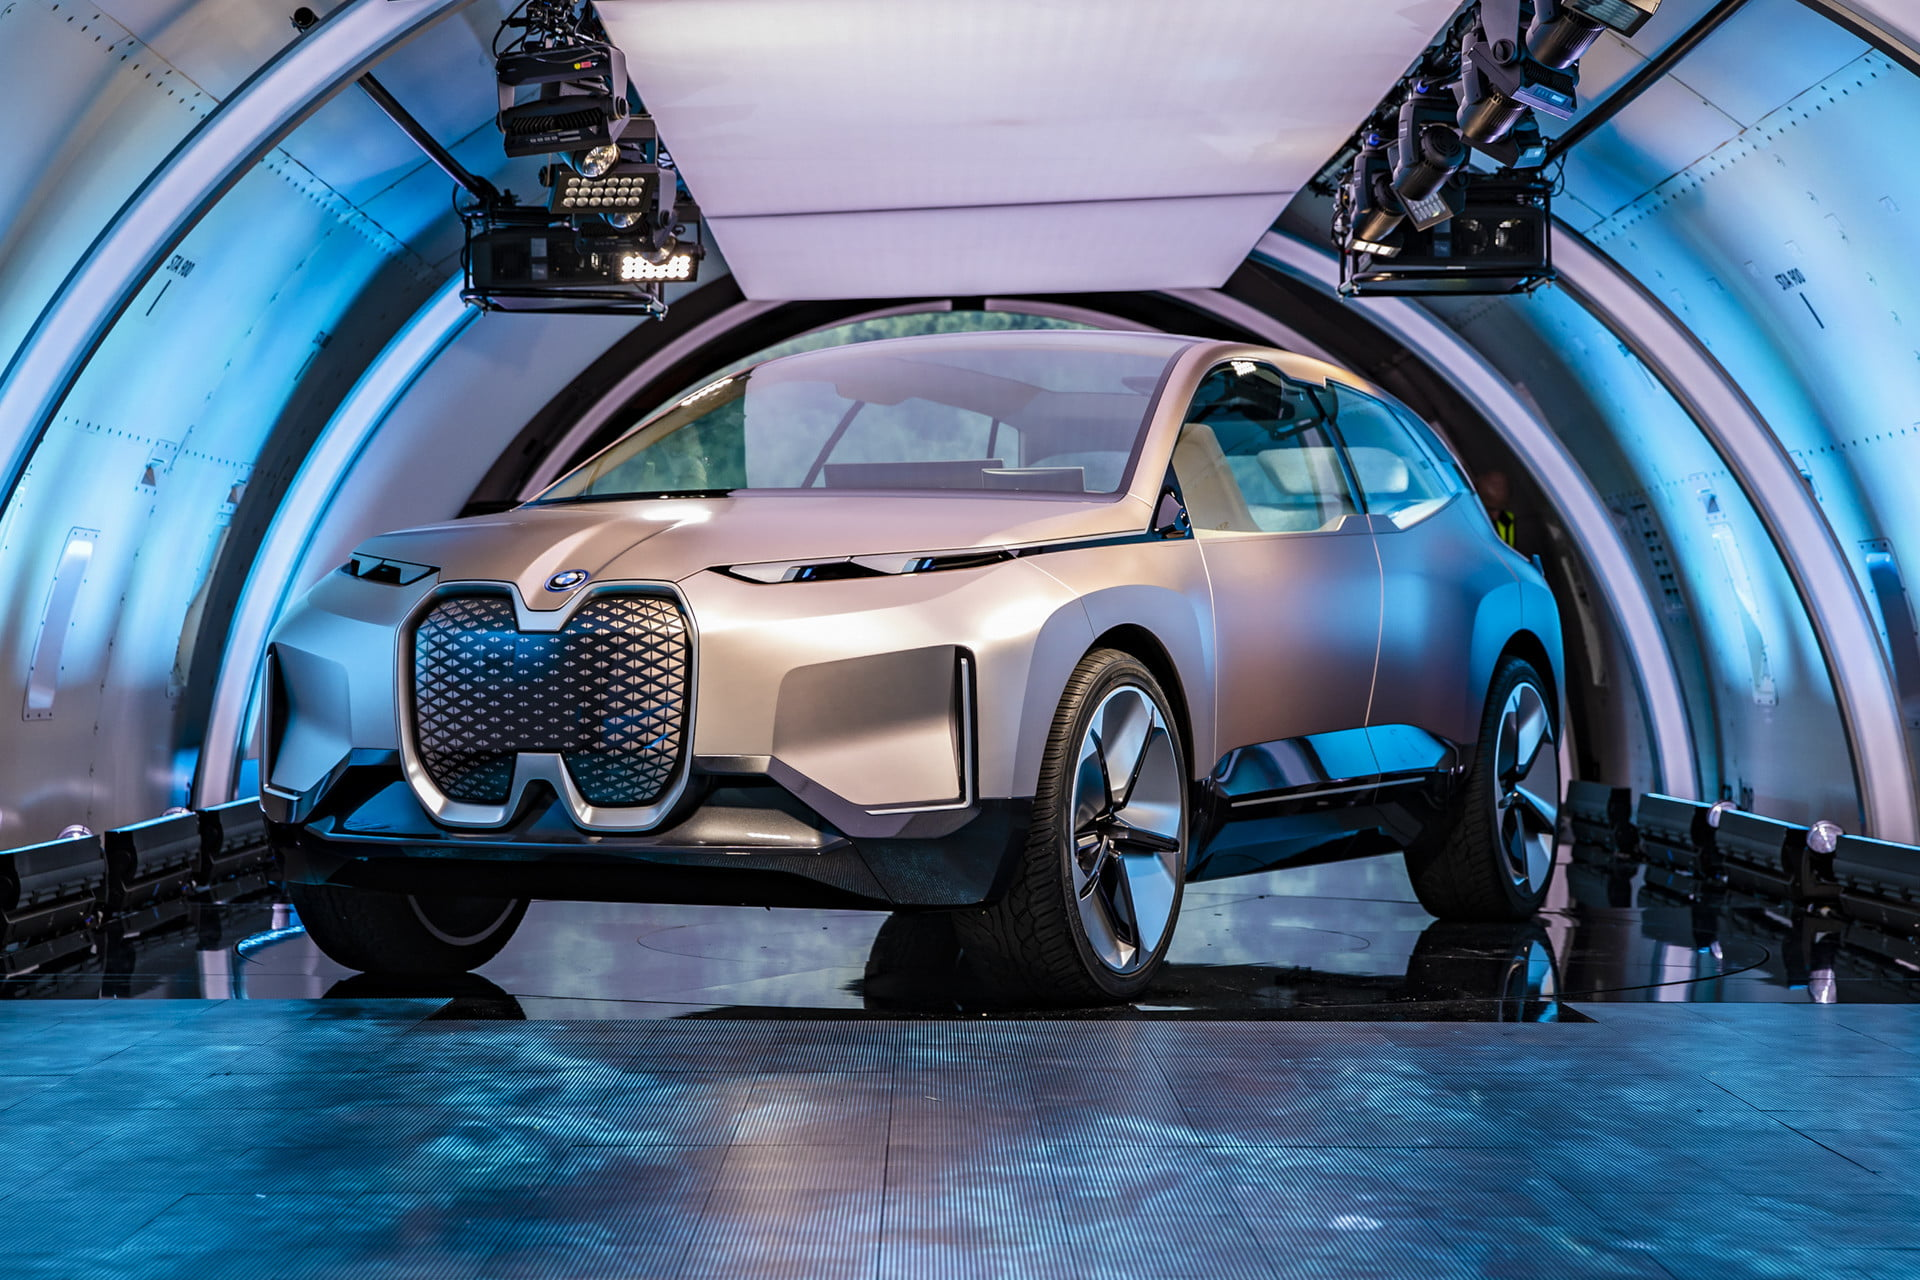 MWC 2019 Day 3: Είδαμε το μέλλον στη Βαρκελώνη